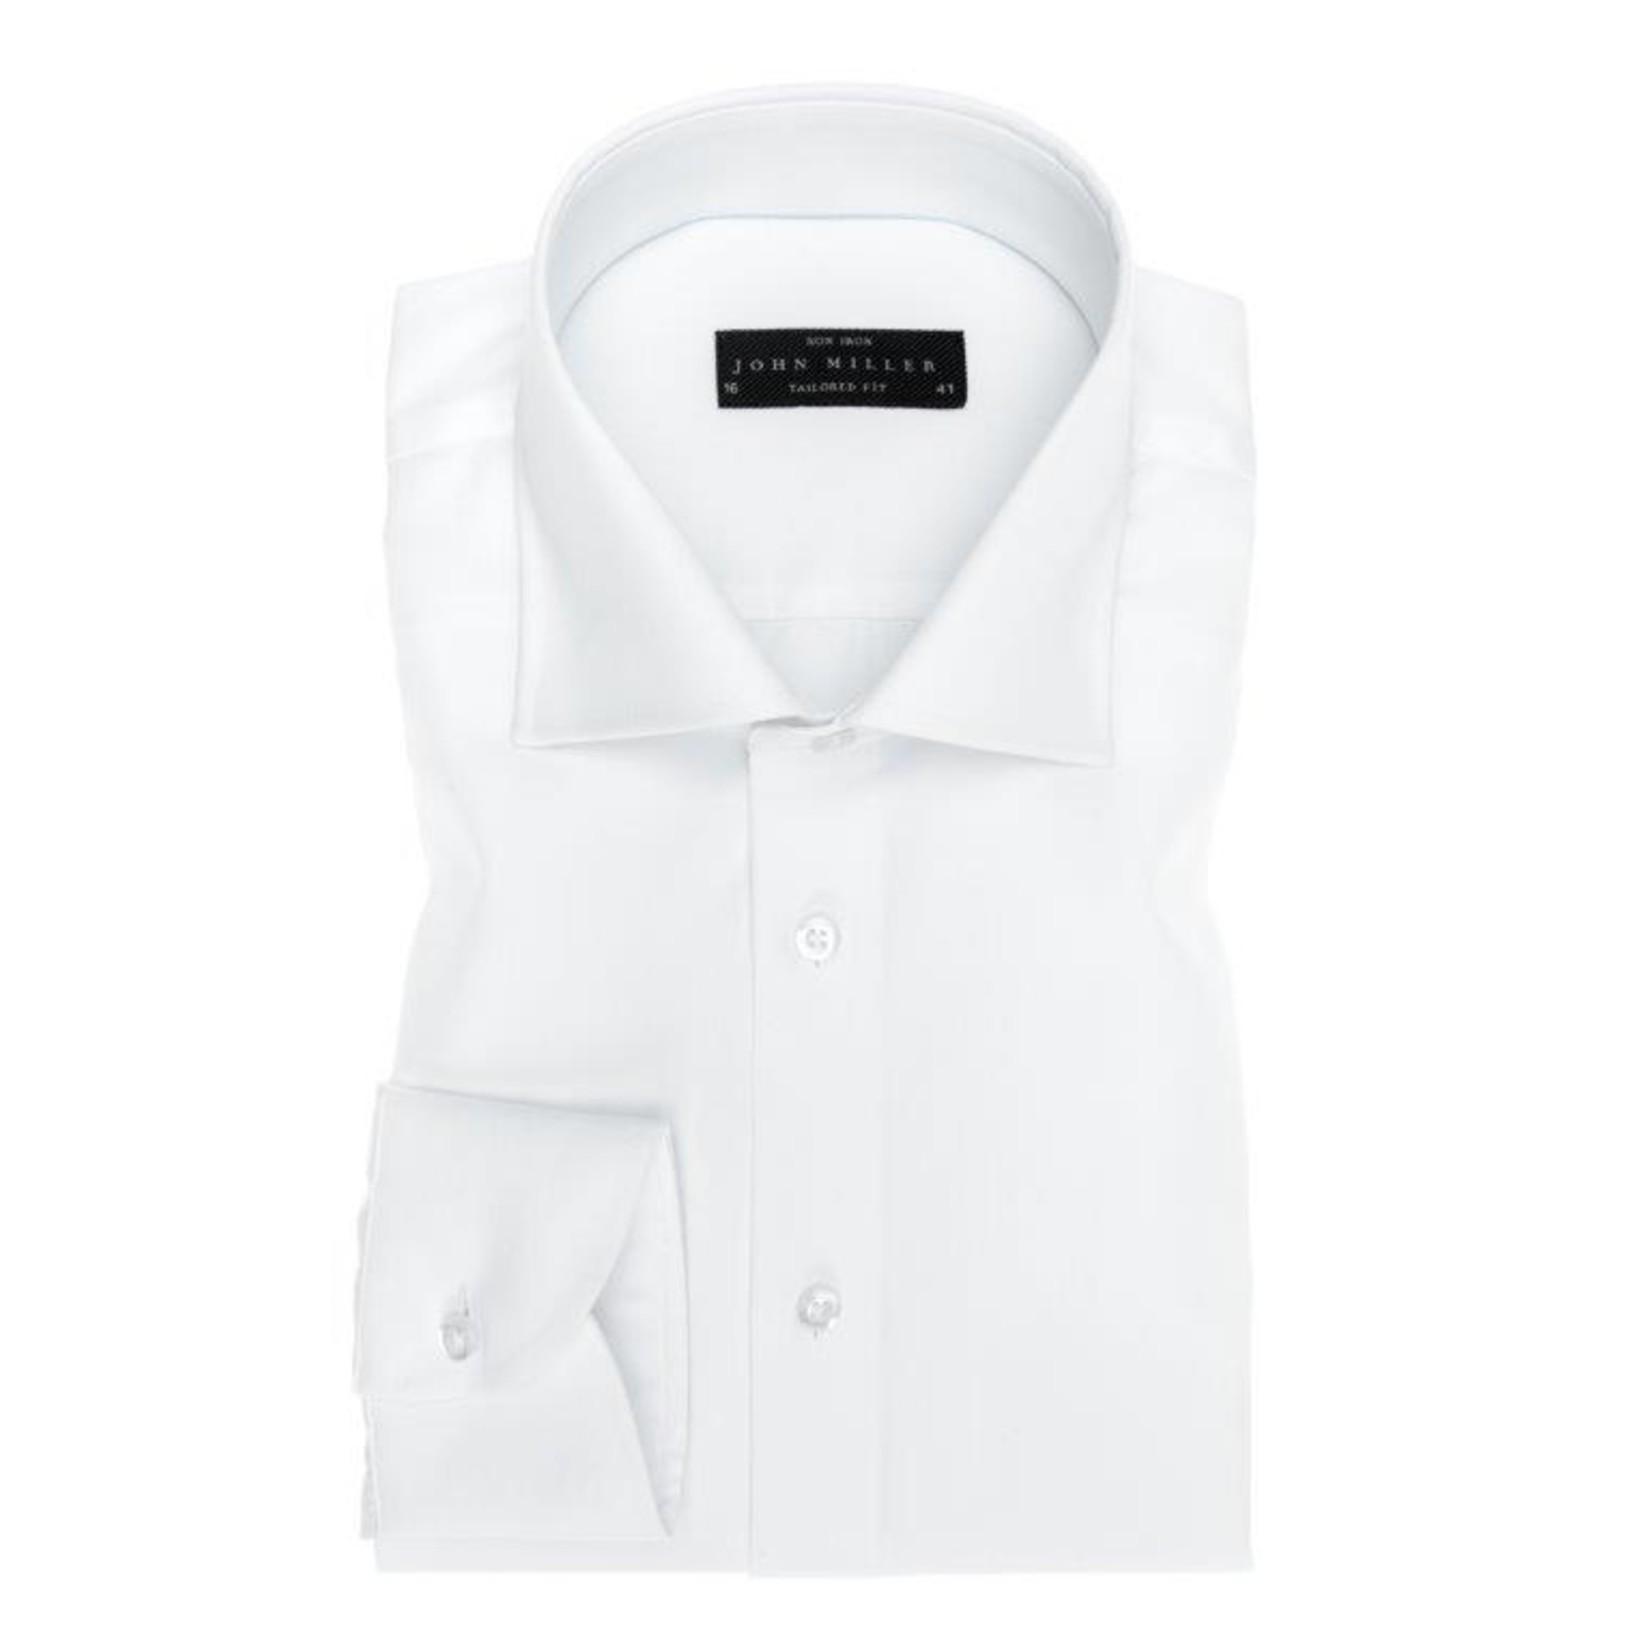 John Miller tailored fit overhemd wit met wide spread boord